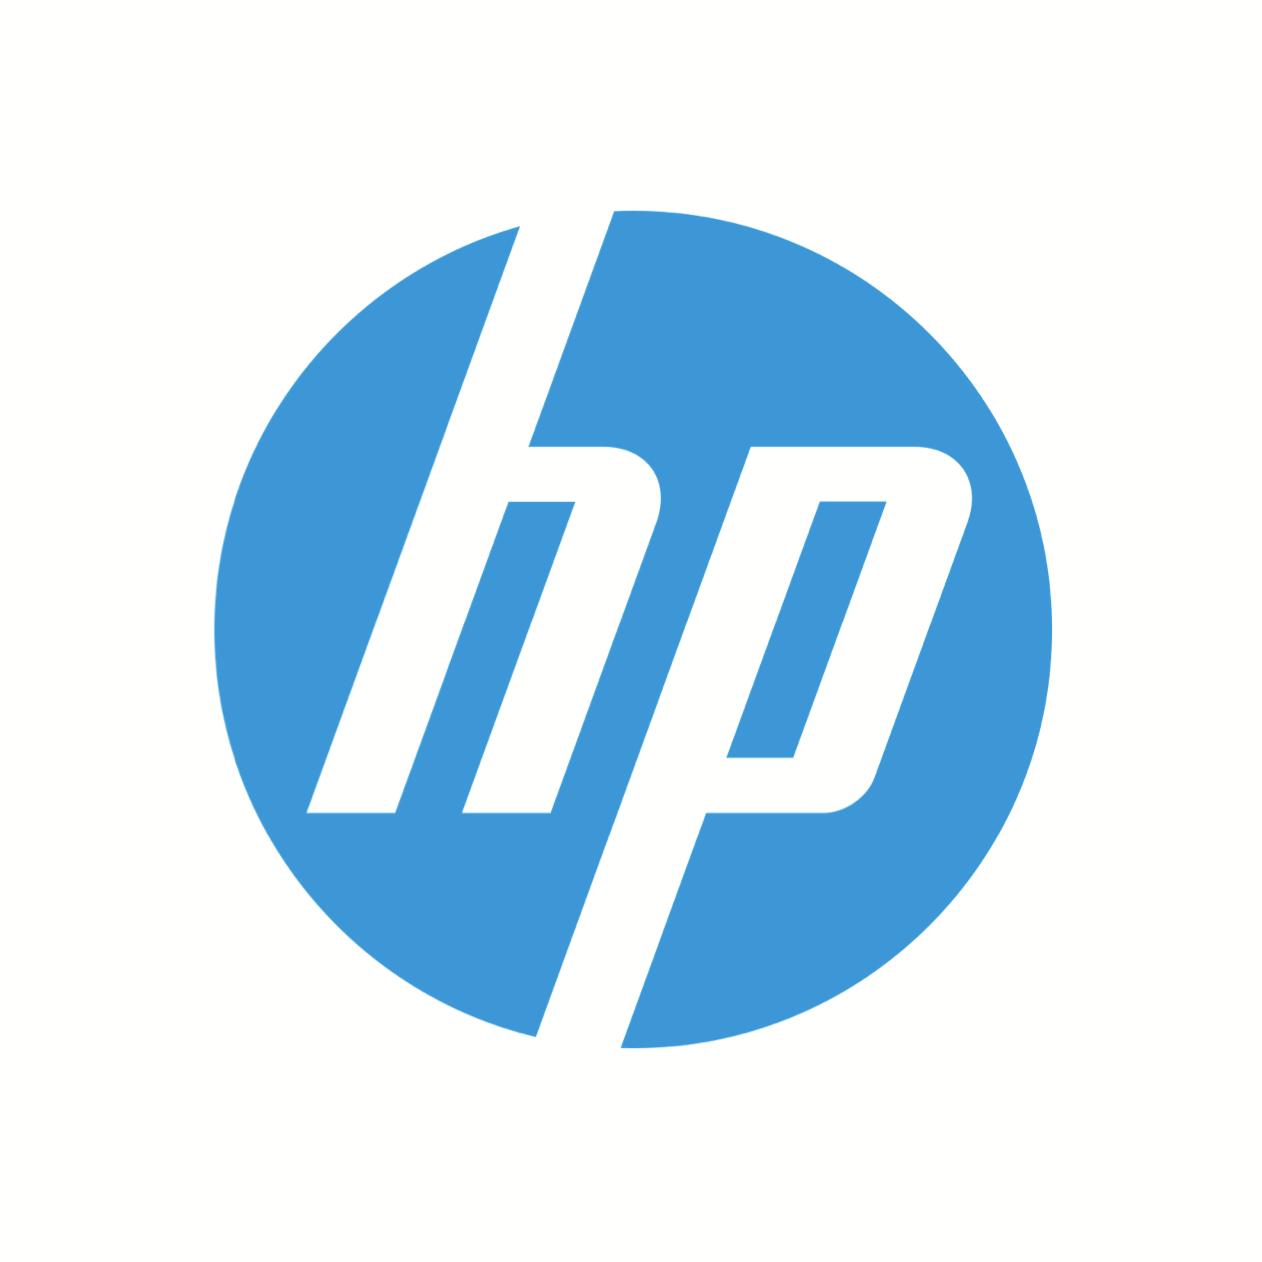 HP Pavilion (i5-11400F, 8GB, 256GB, 3060 12GB) - $1124.79